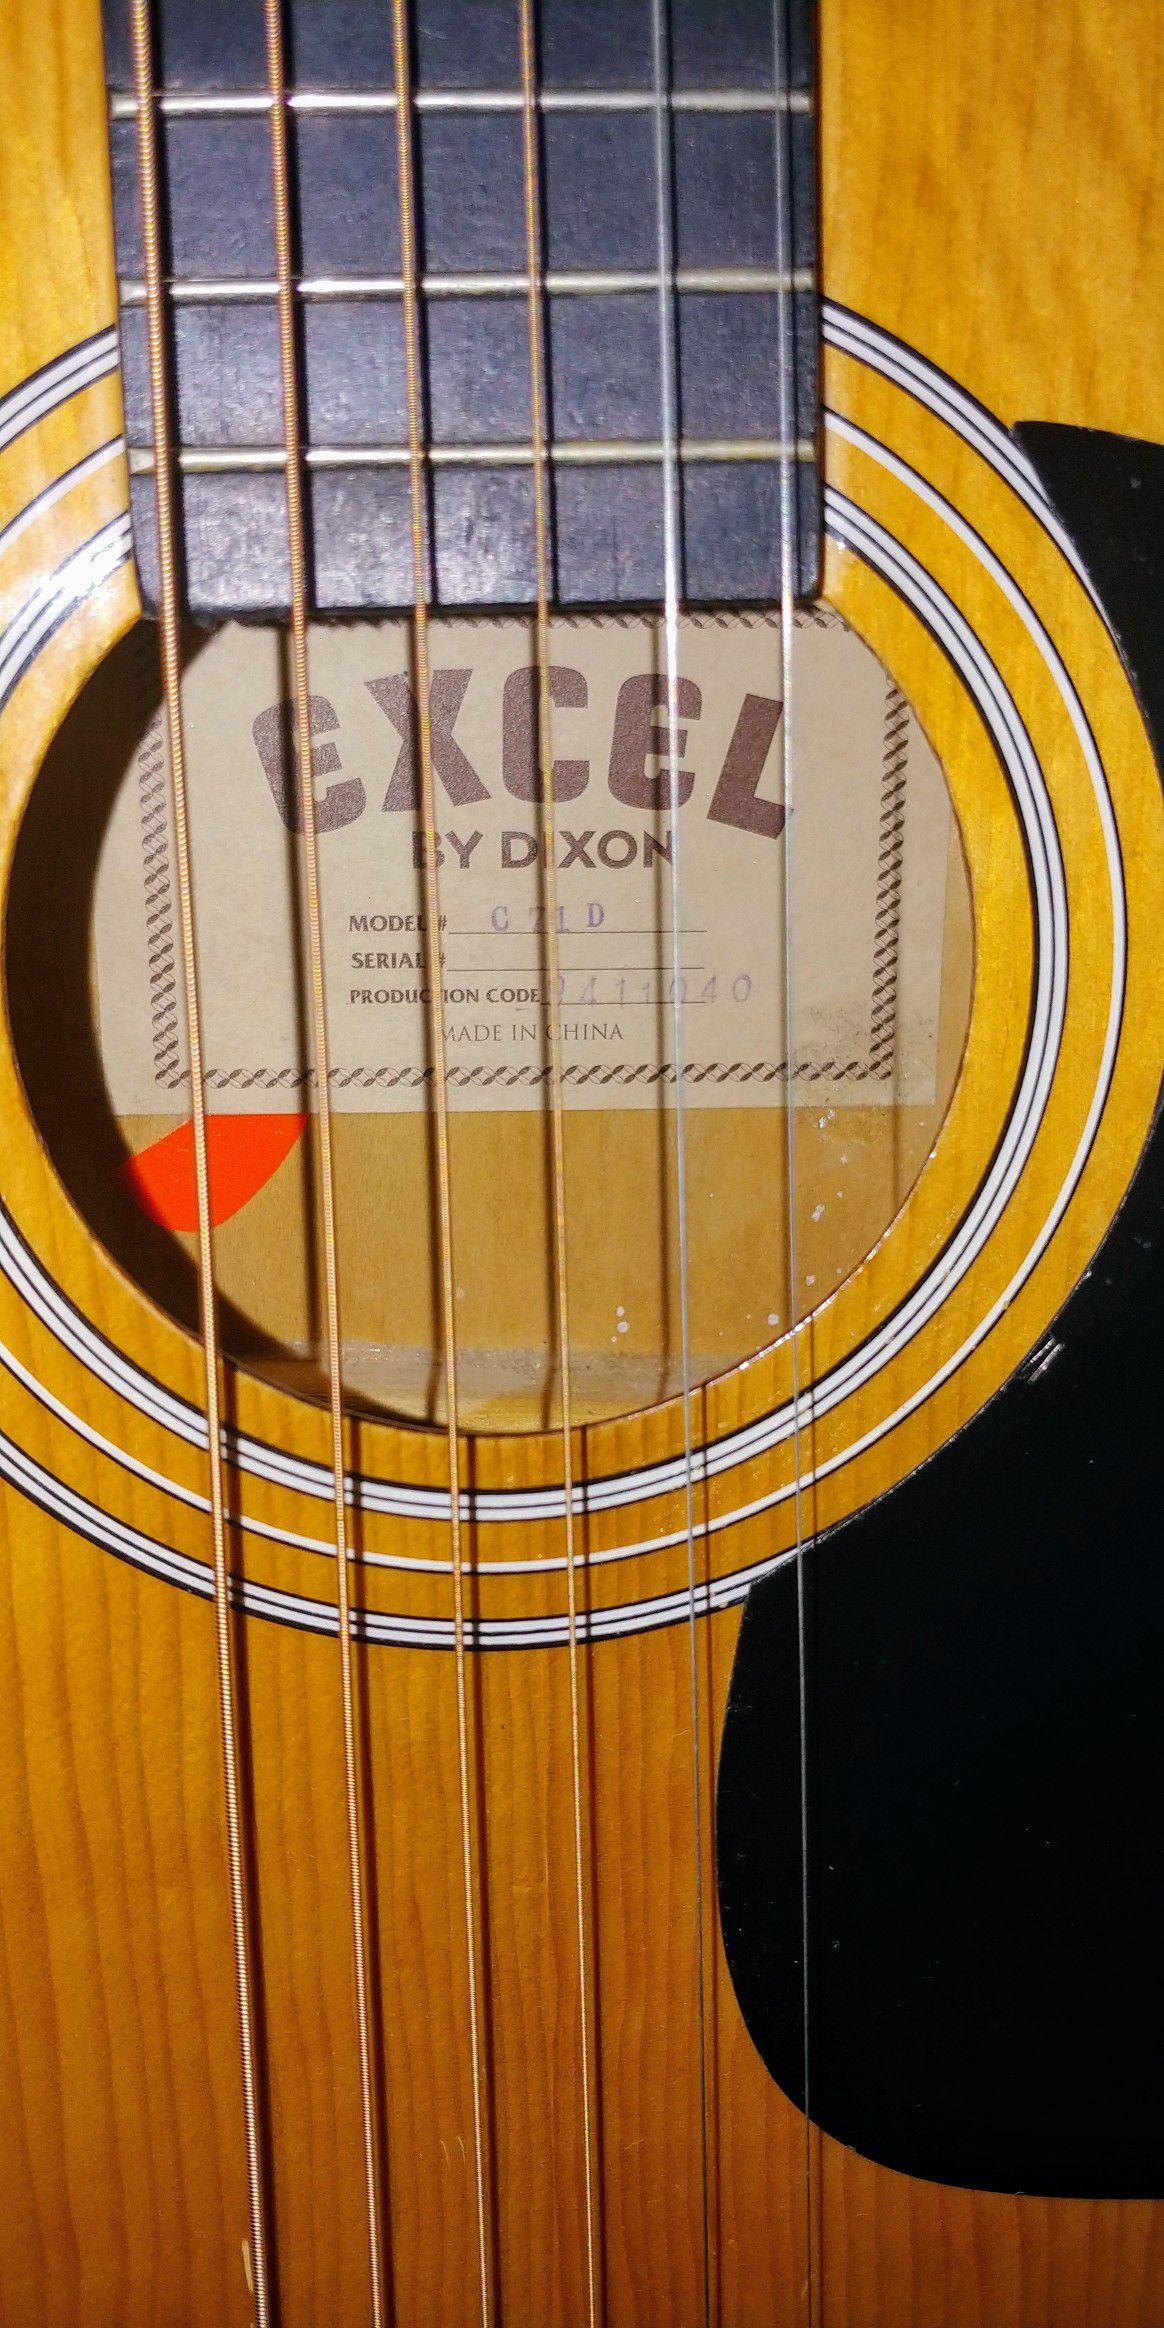 Guitar Excel by Dixon Model #C71D